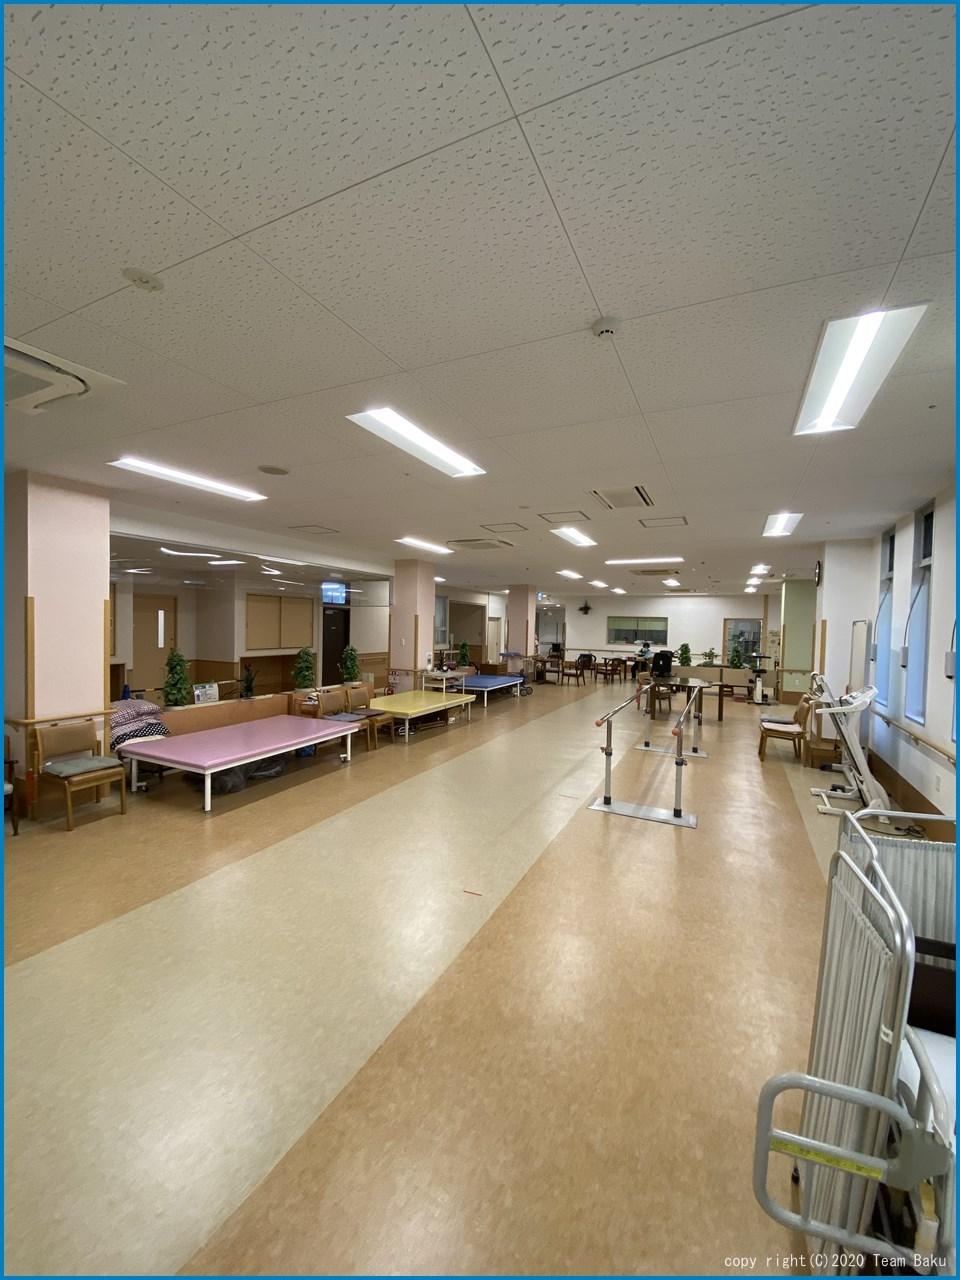 N病院グループ Nナーシング南館 改修・増築工事 6_c0376508_17110518.jpg